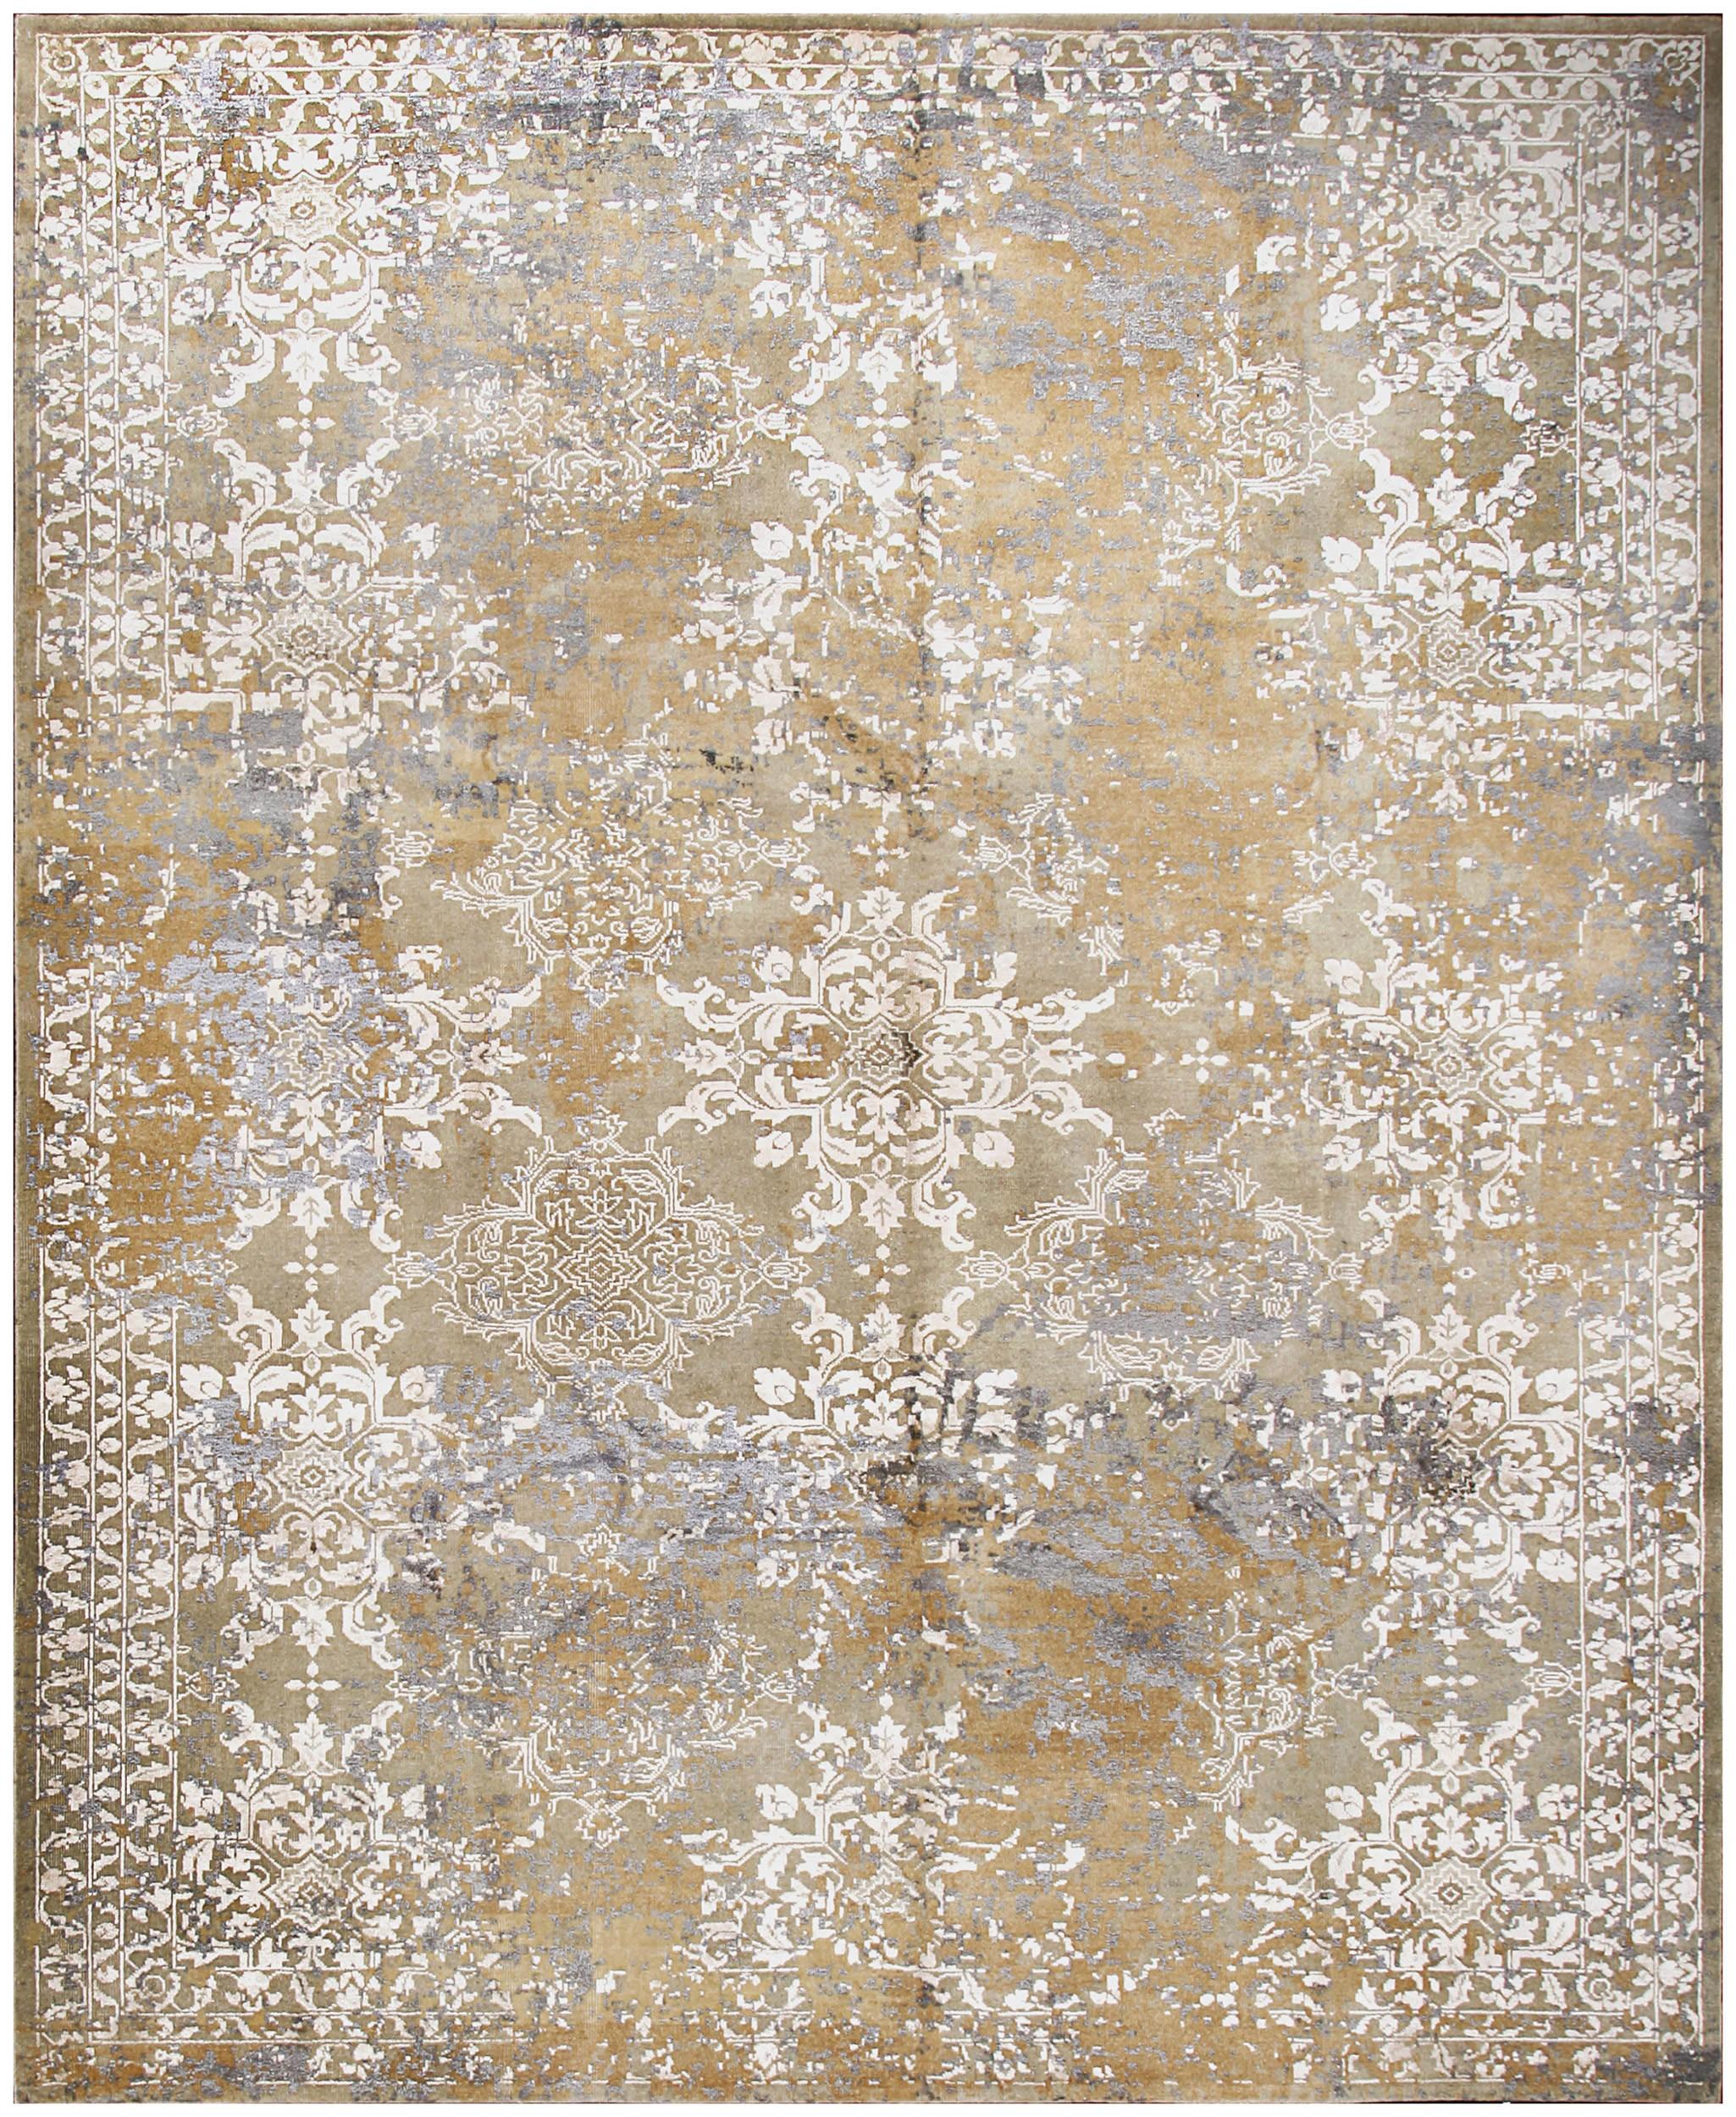 silk rug texture designer reserve gold hand knotted wool u0026 silk rug 19072 PBZCIQL